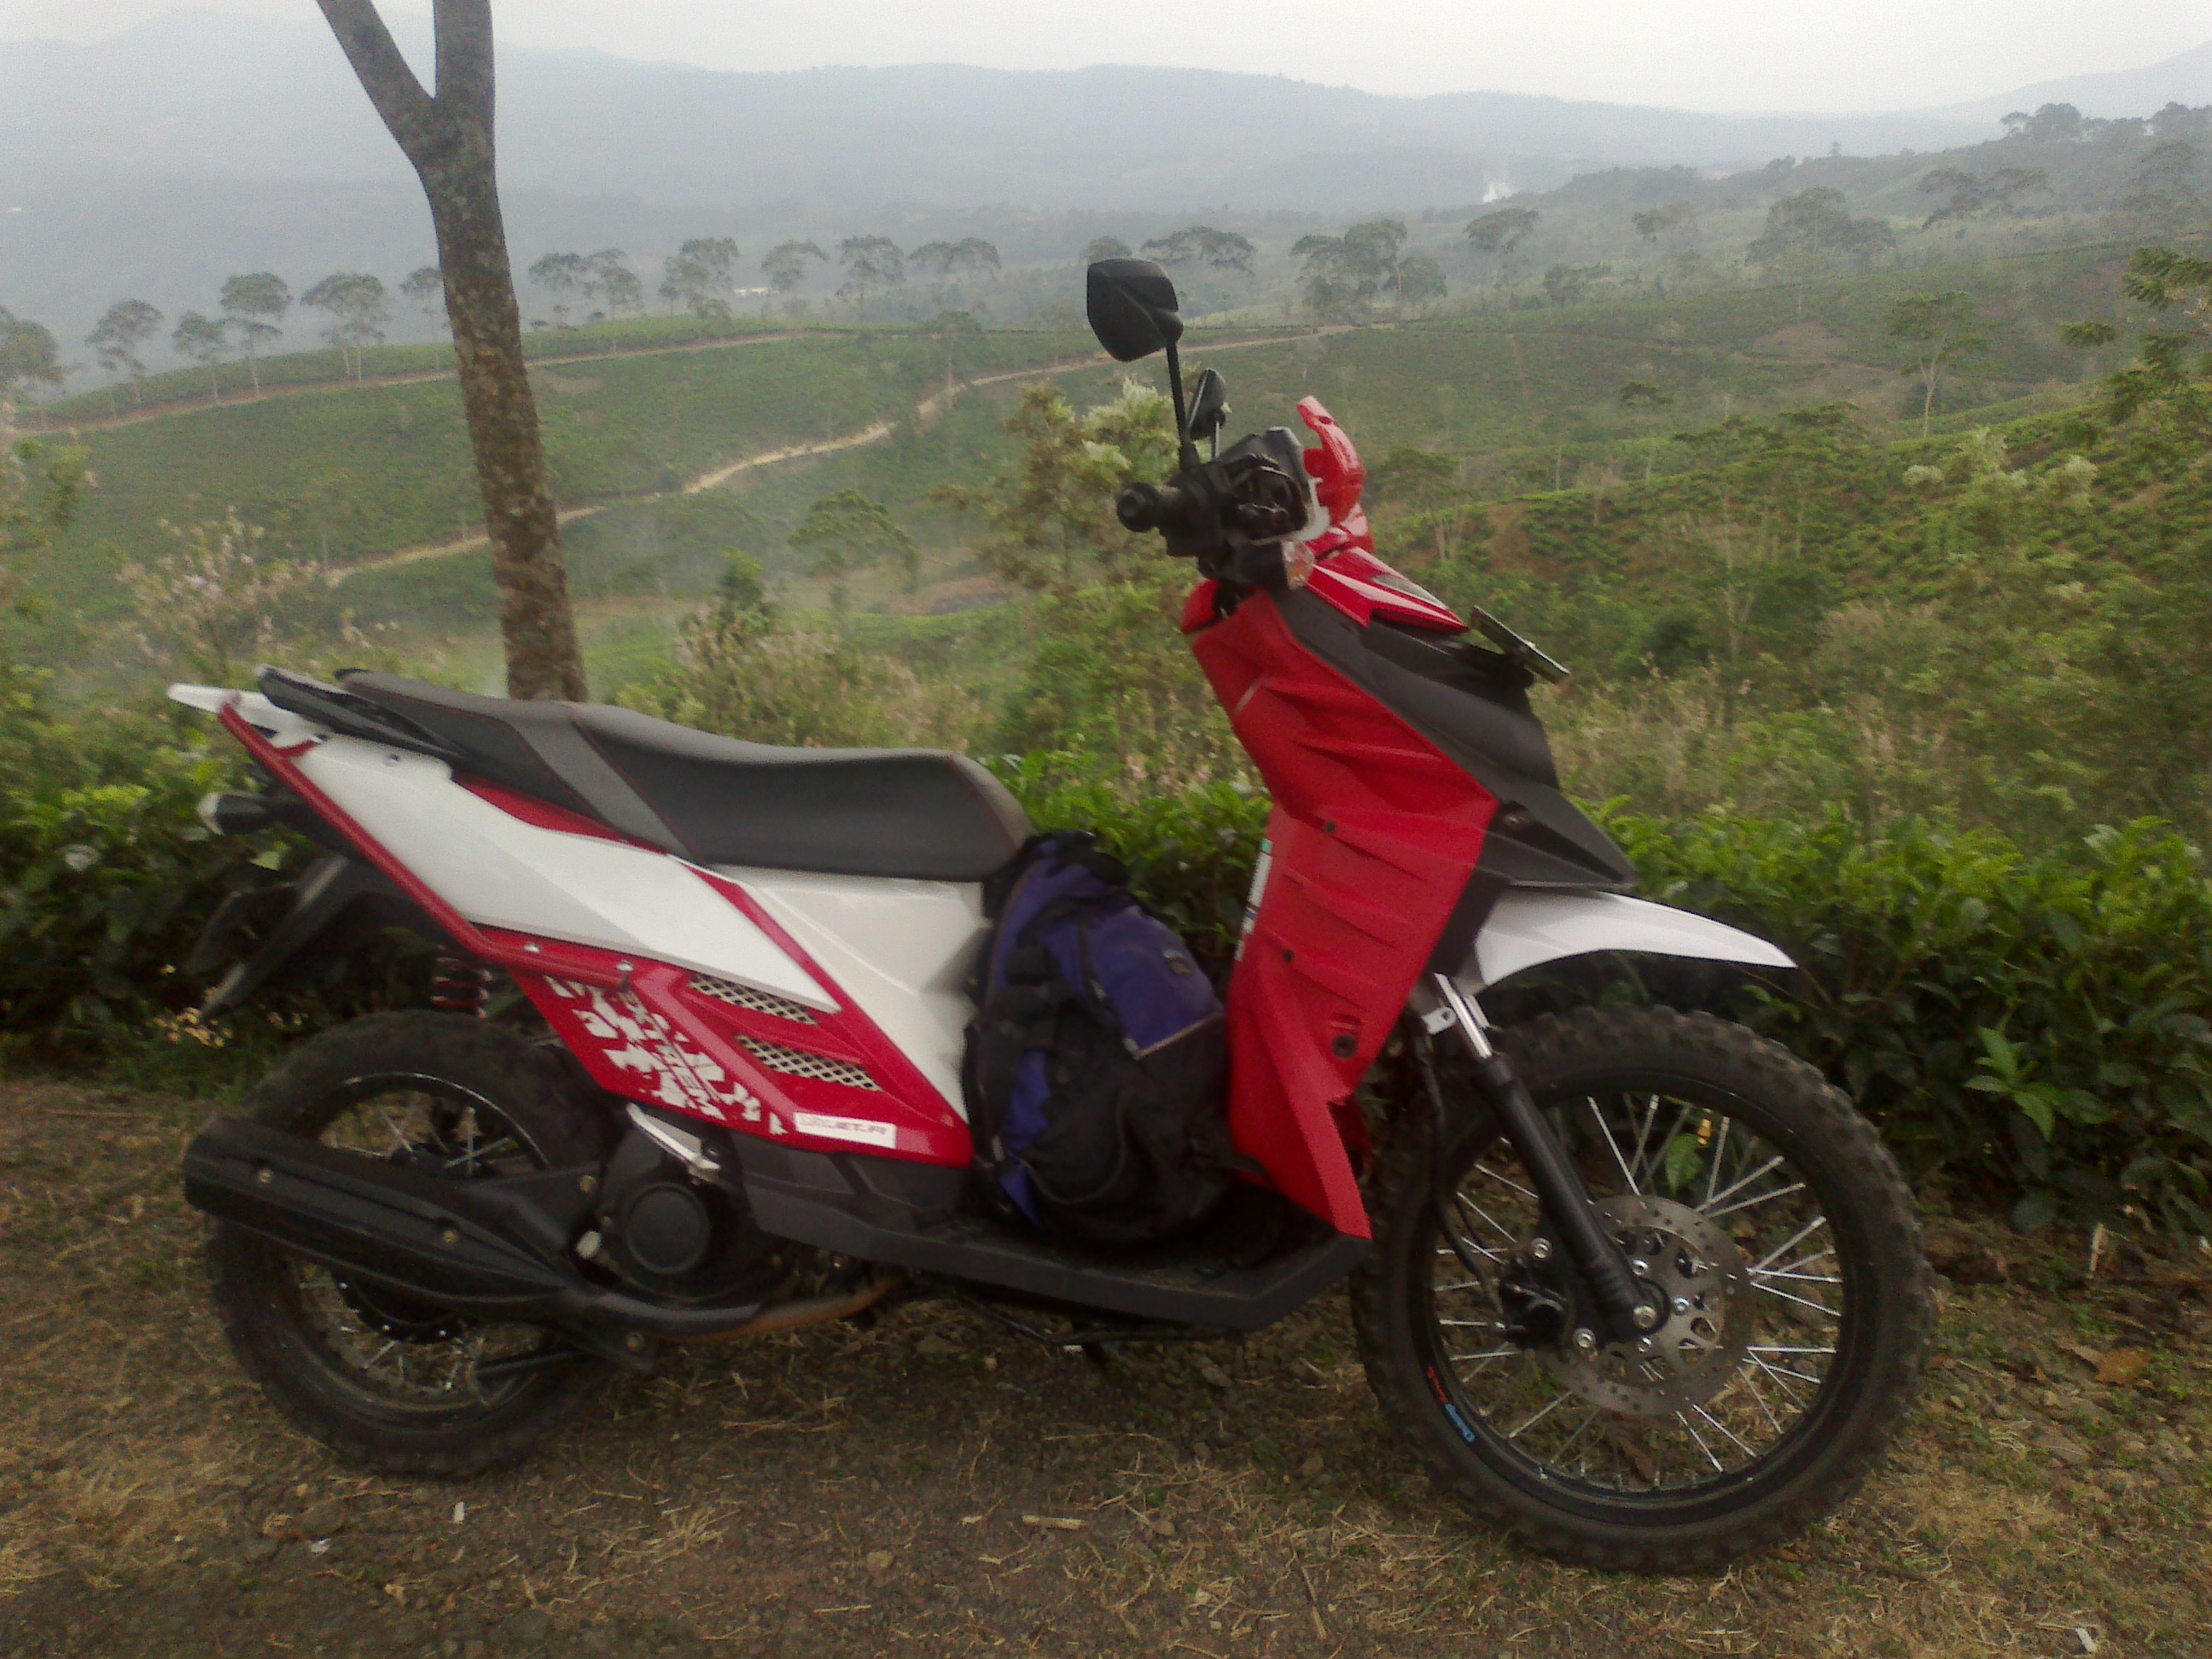 44 Ide Modifikasi Mio Jadi X Ride Terbaik Kurama Motor